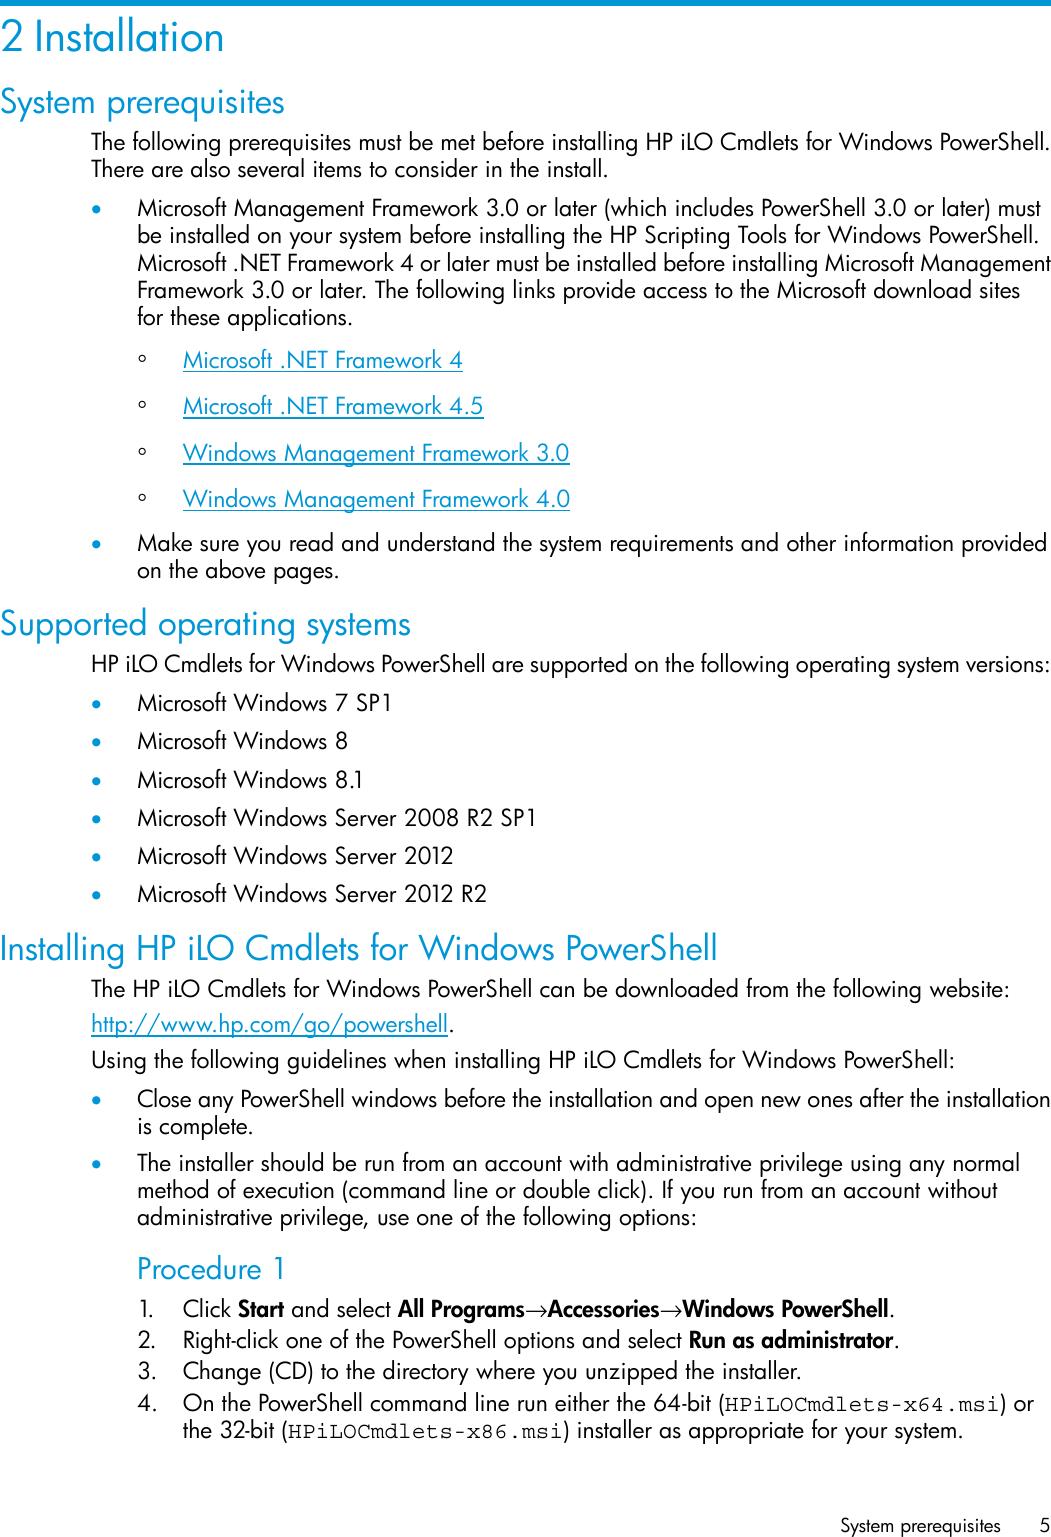 Hp Scripting Tools For Windows Powershell Users Manual User